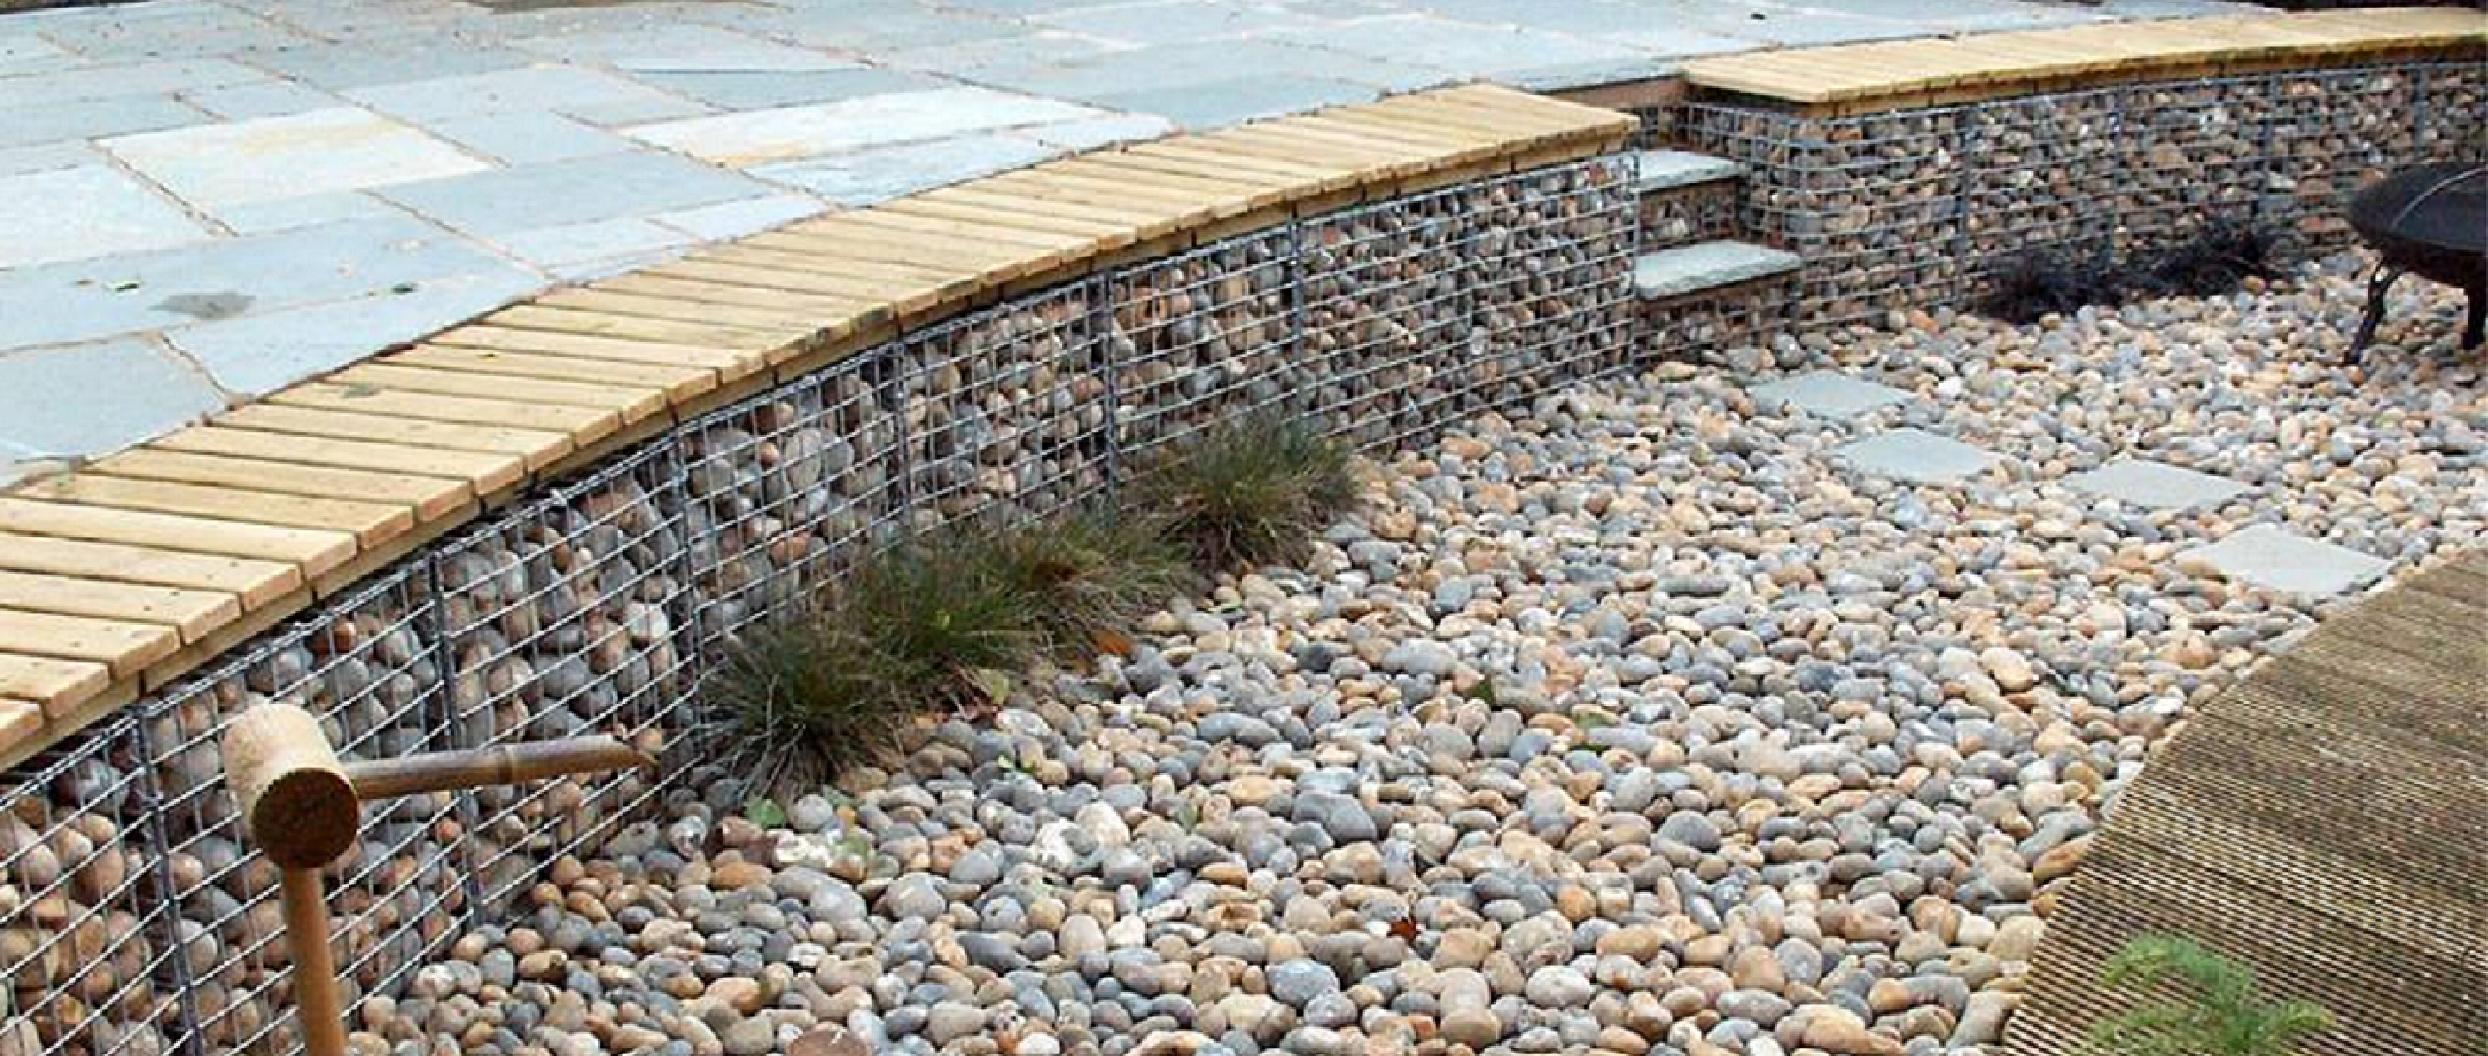 small gabion 675mm x 675mm x 675mm devoran garden gabions. Black Bedroom Furniture Sets. Home Design Ideas